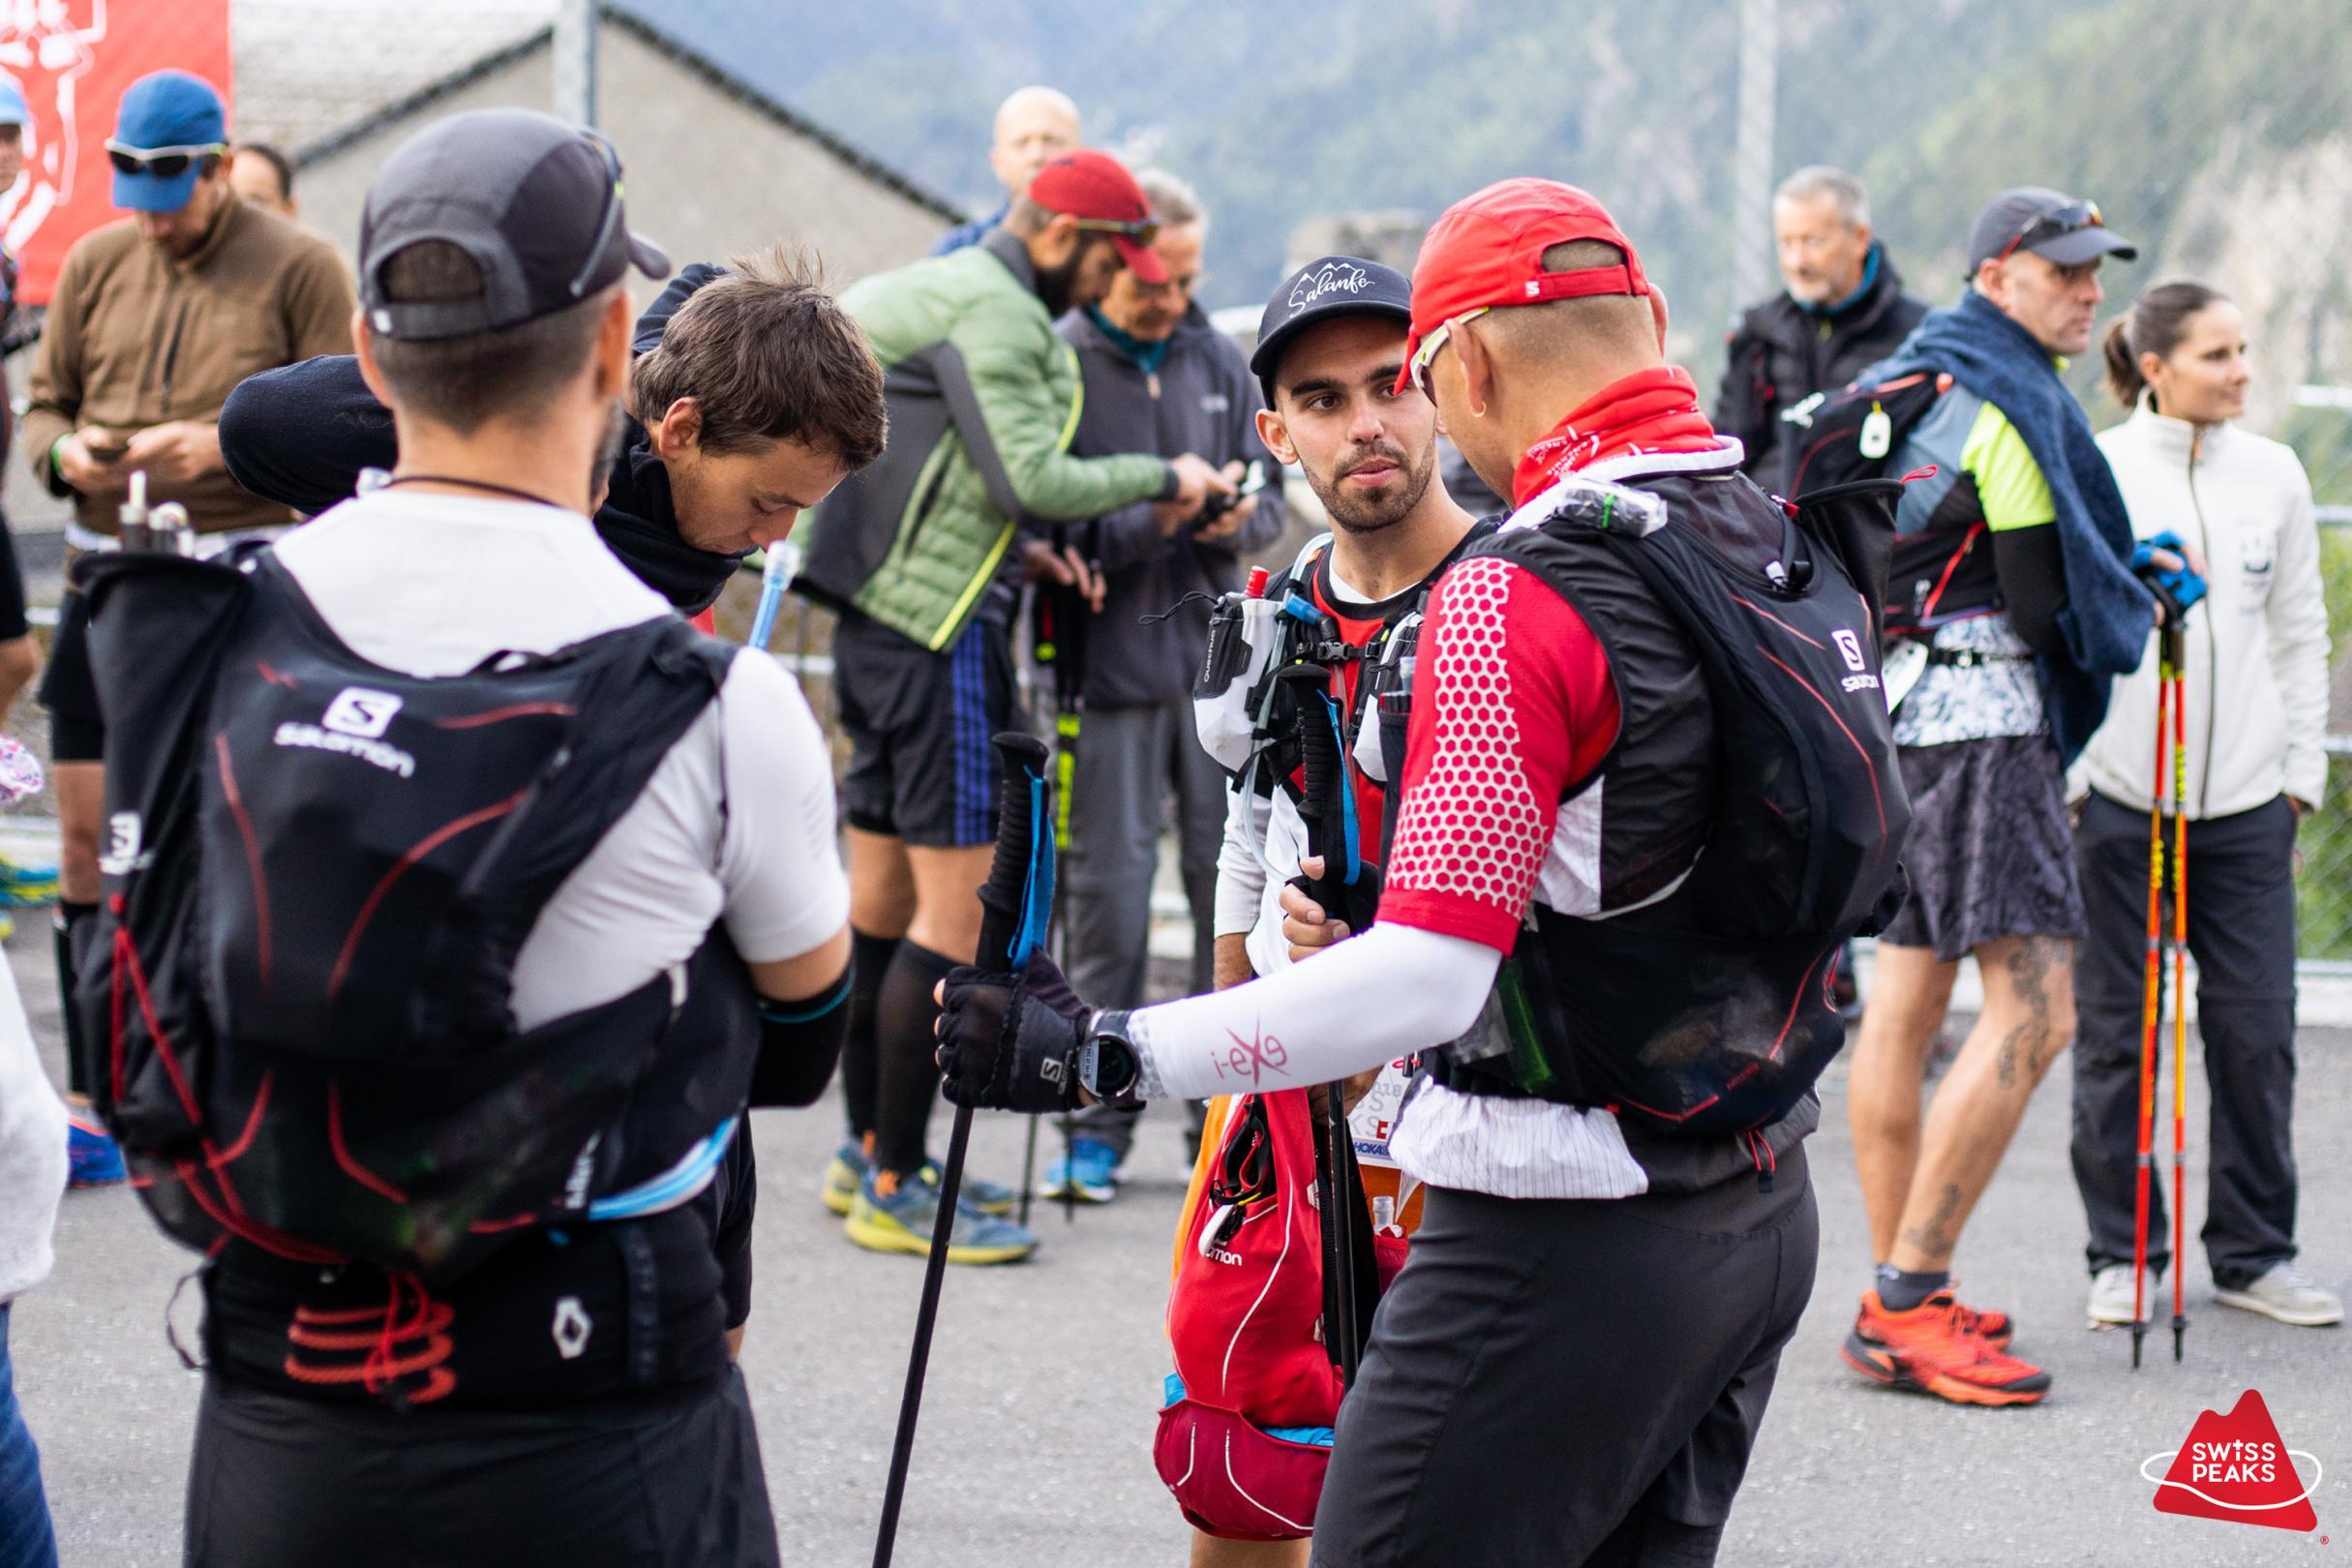 SwissPeaks Trail_Coureurs discutent.jpg